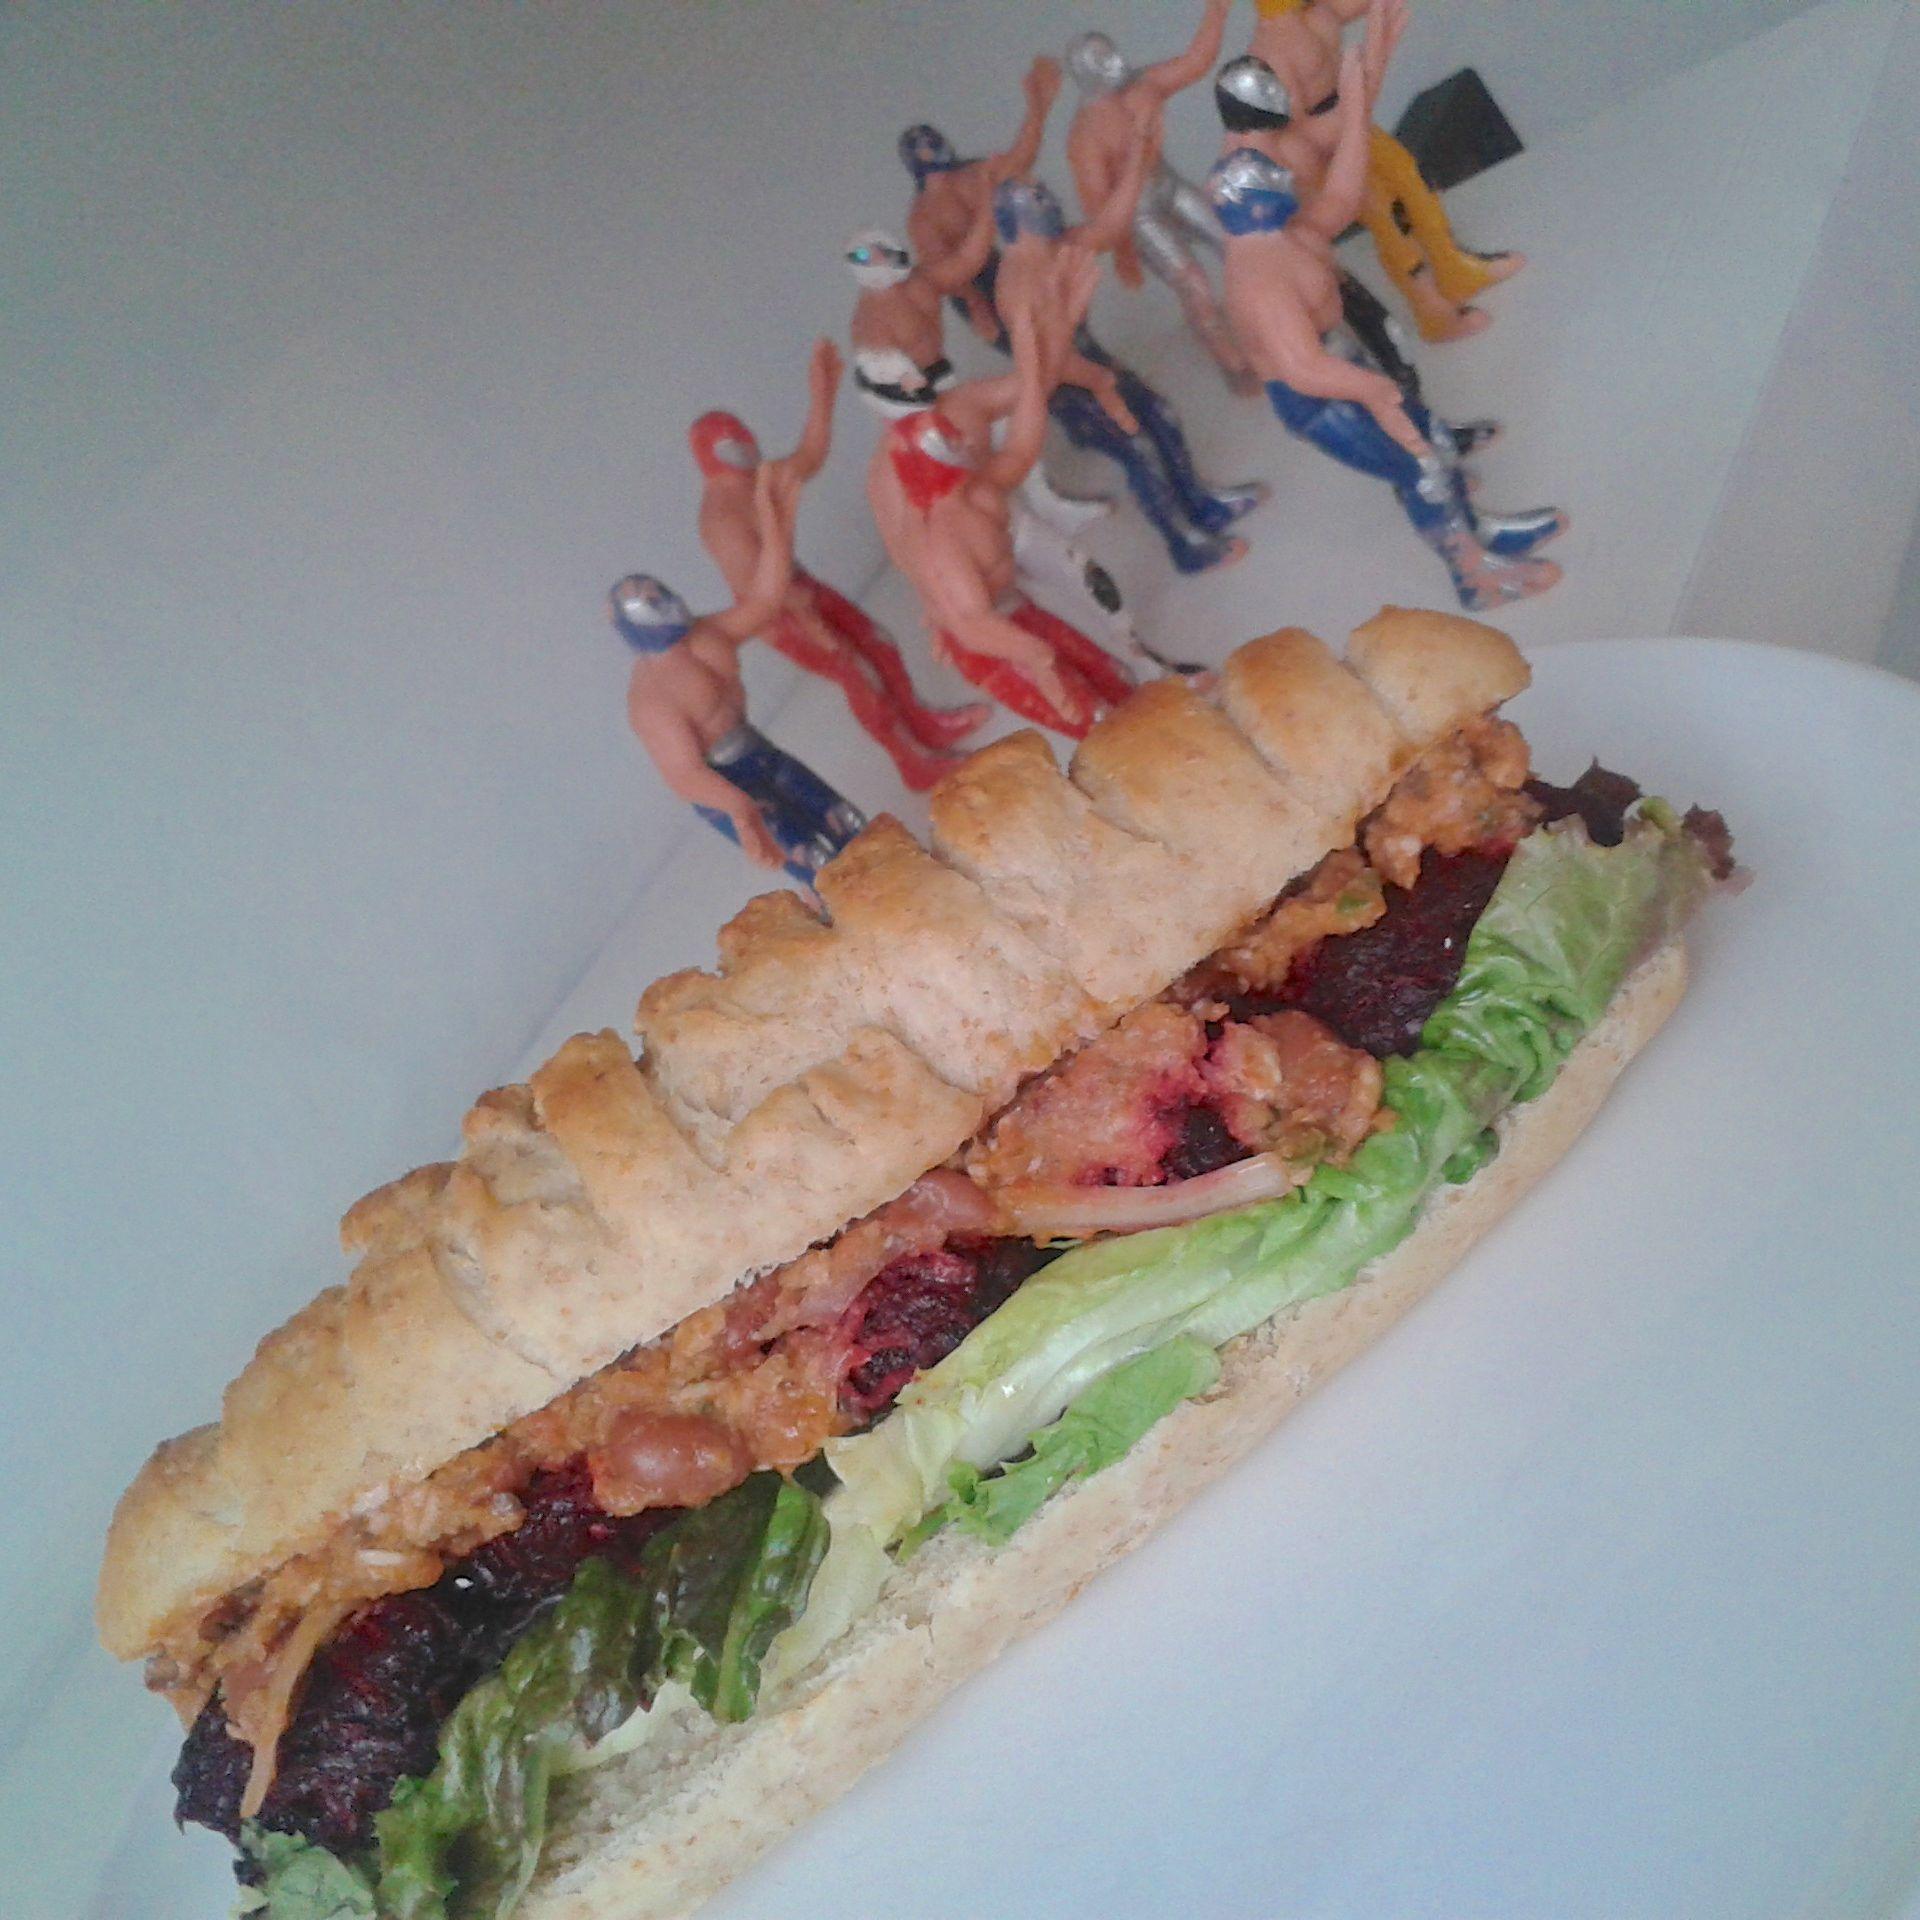 https://i0.wp.com/fatgayvegan.com/wp-content/uploads/2014/02/falafel-sandwich.jpg?fit=1920%2C1920